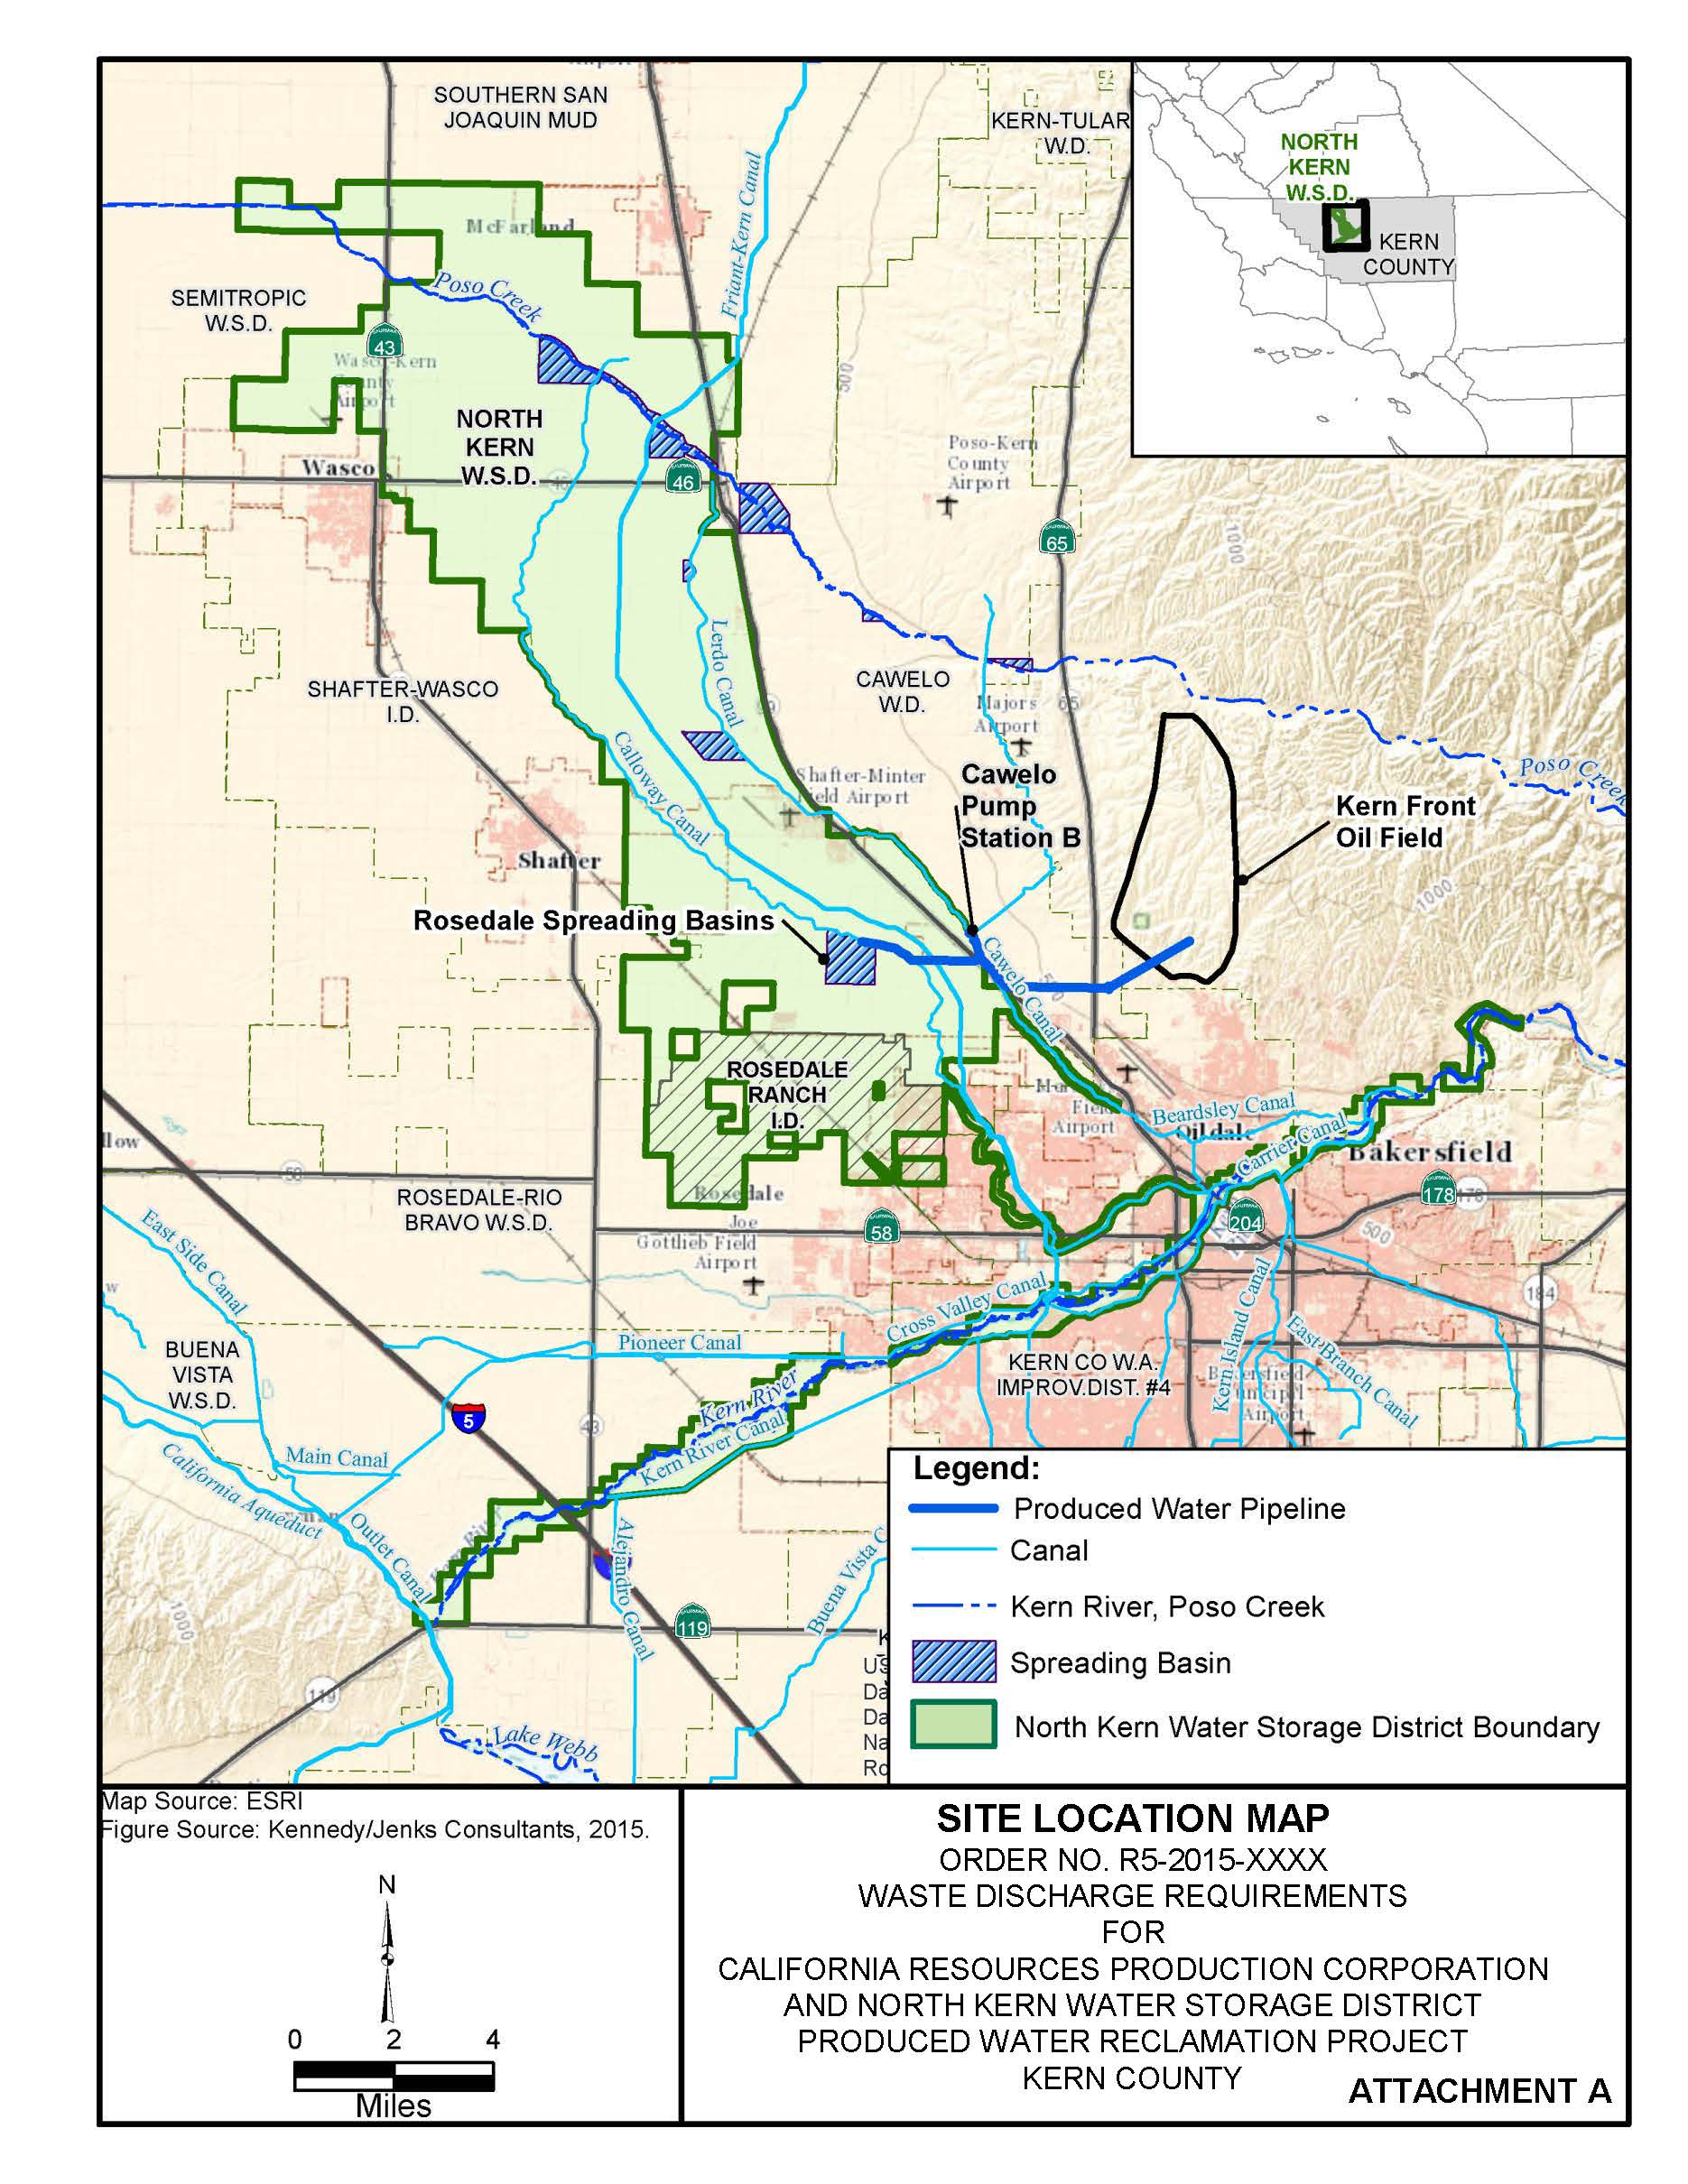 Site Location Map - California Resources Corporation